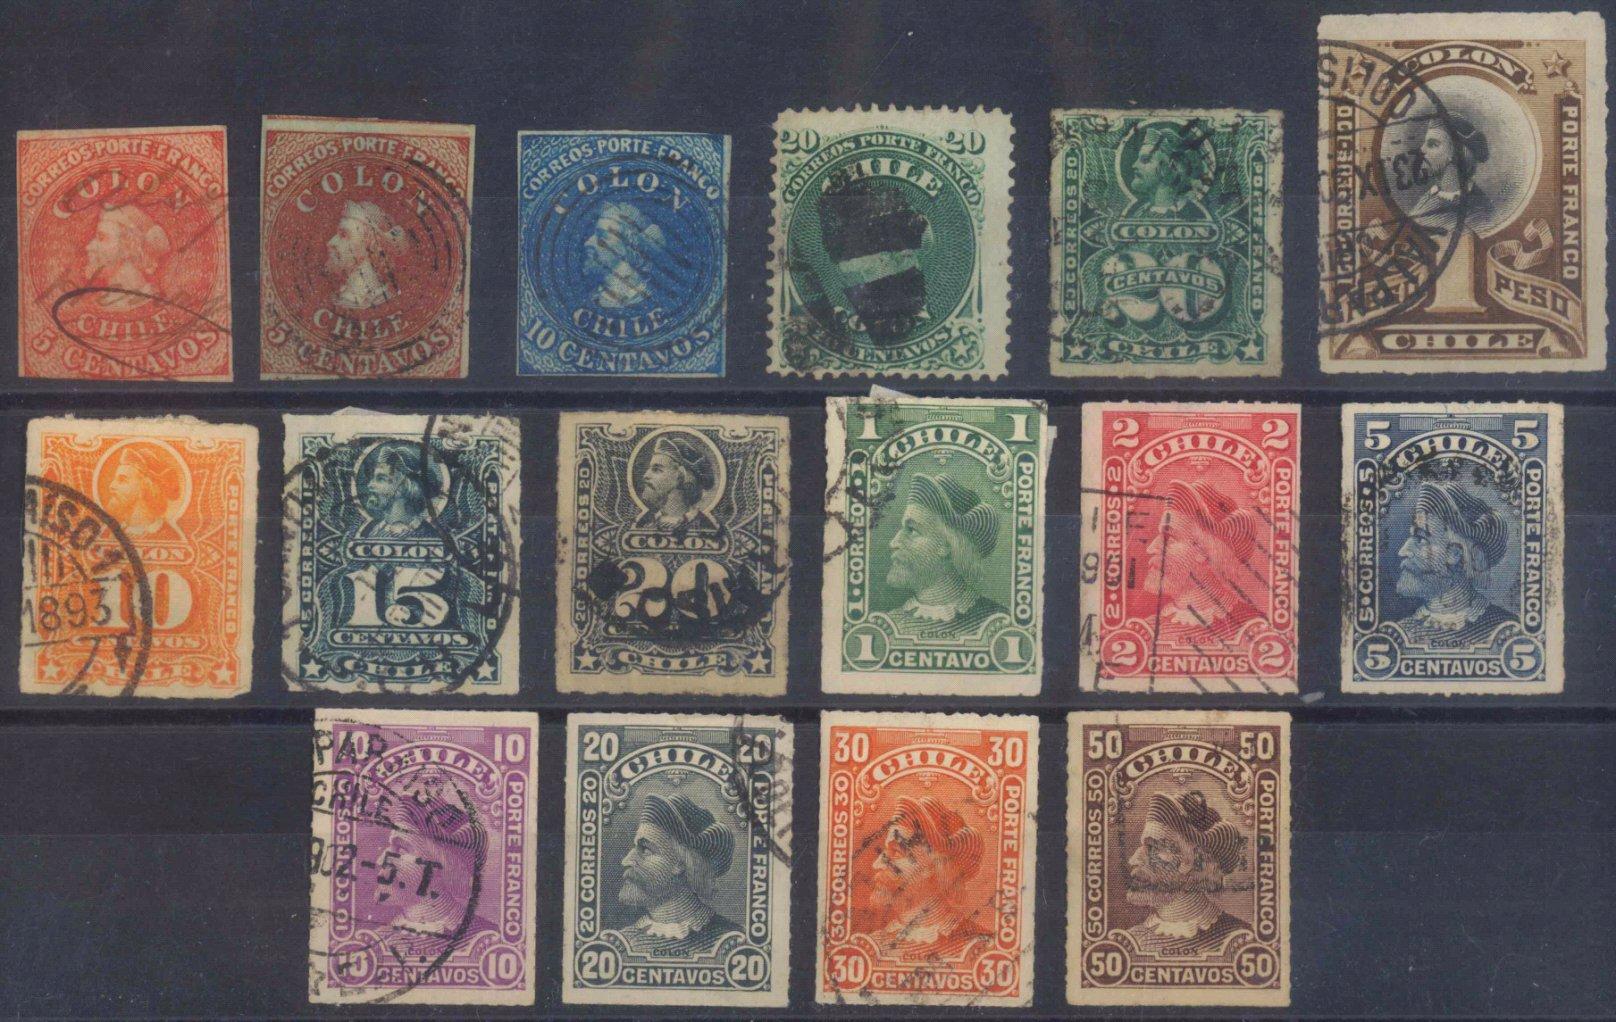 CHILE, klassische Marken ab 1853 (COLON)